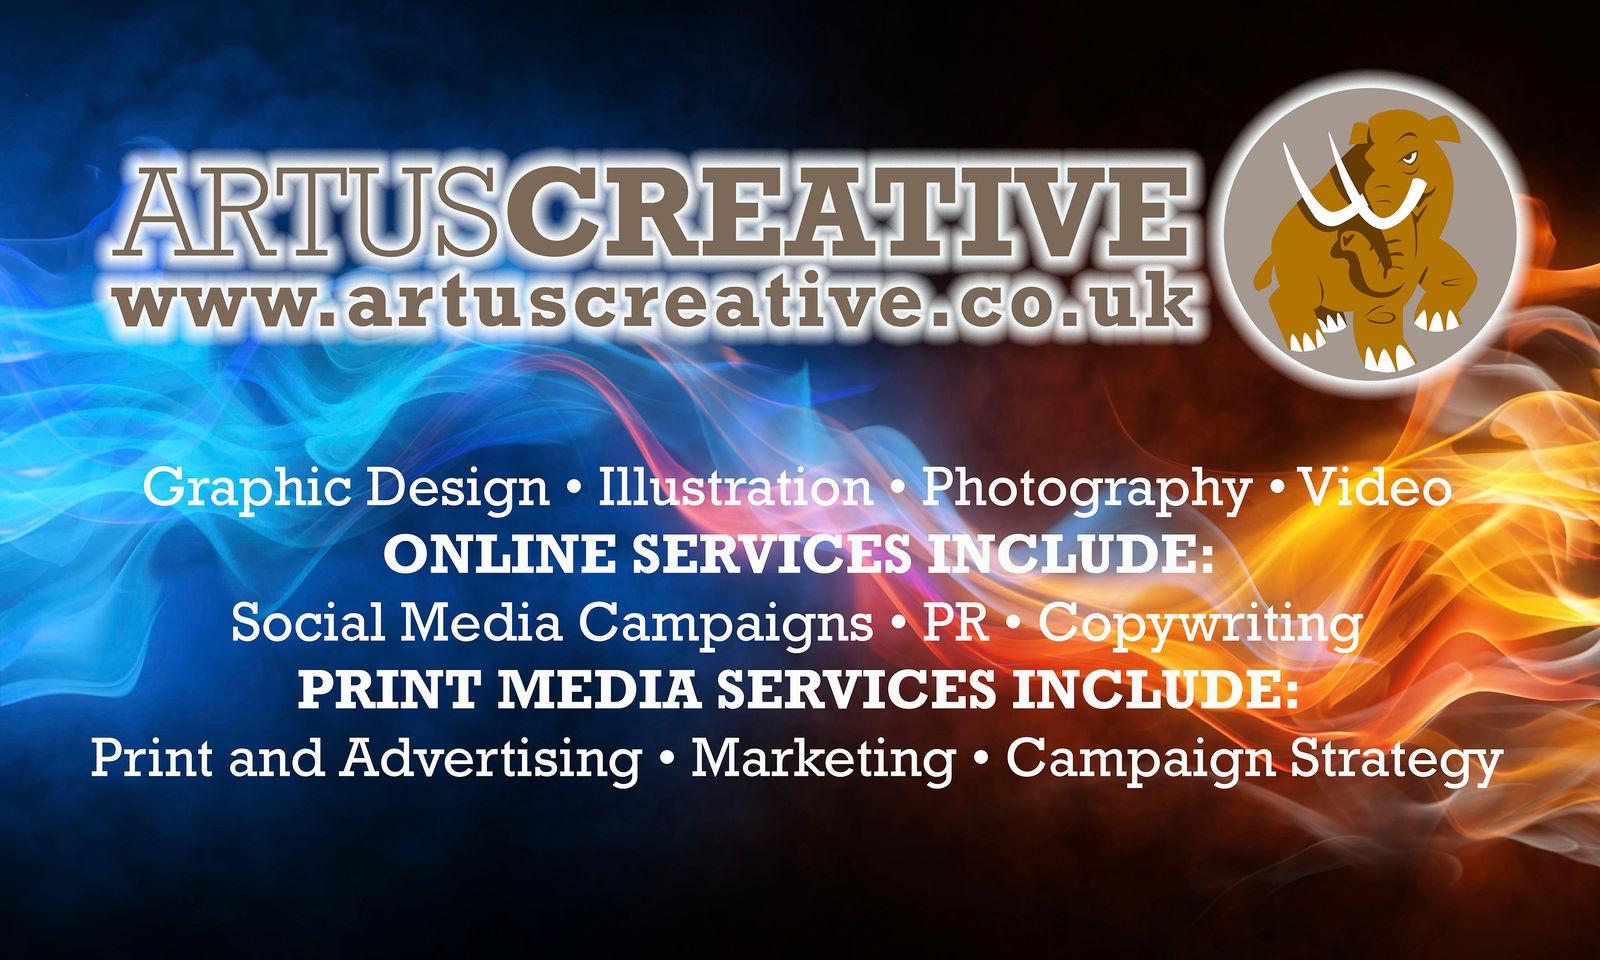 Artus servicesheader.jpg